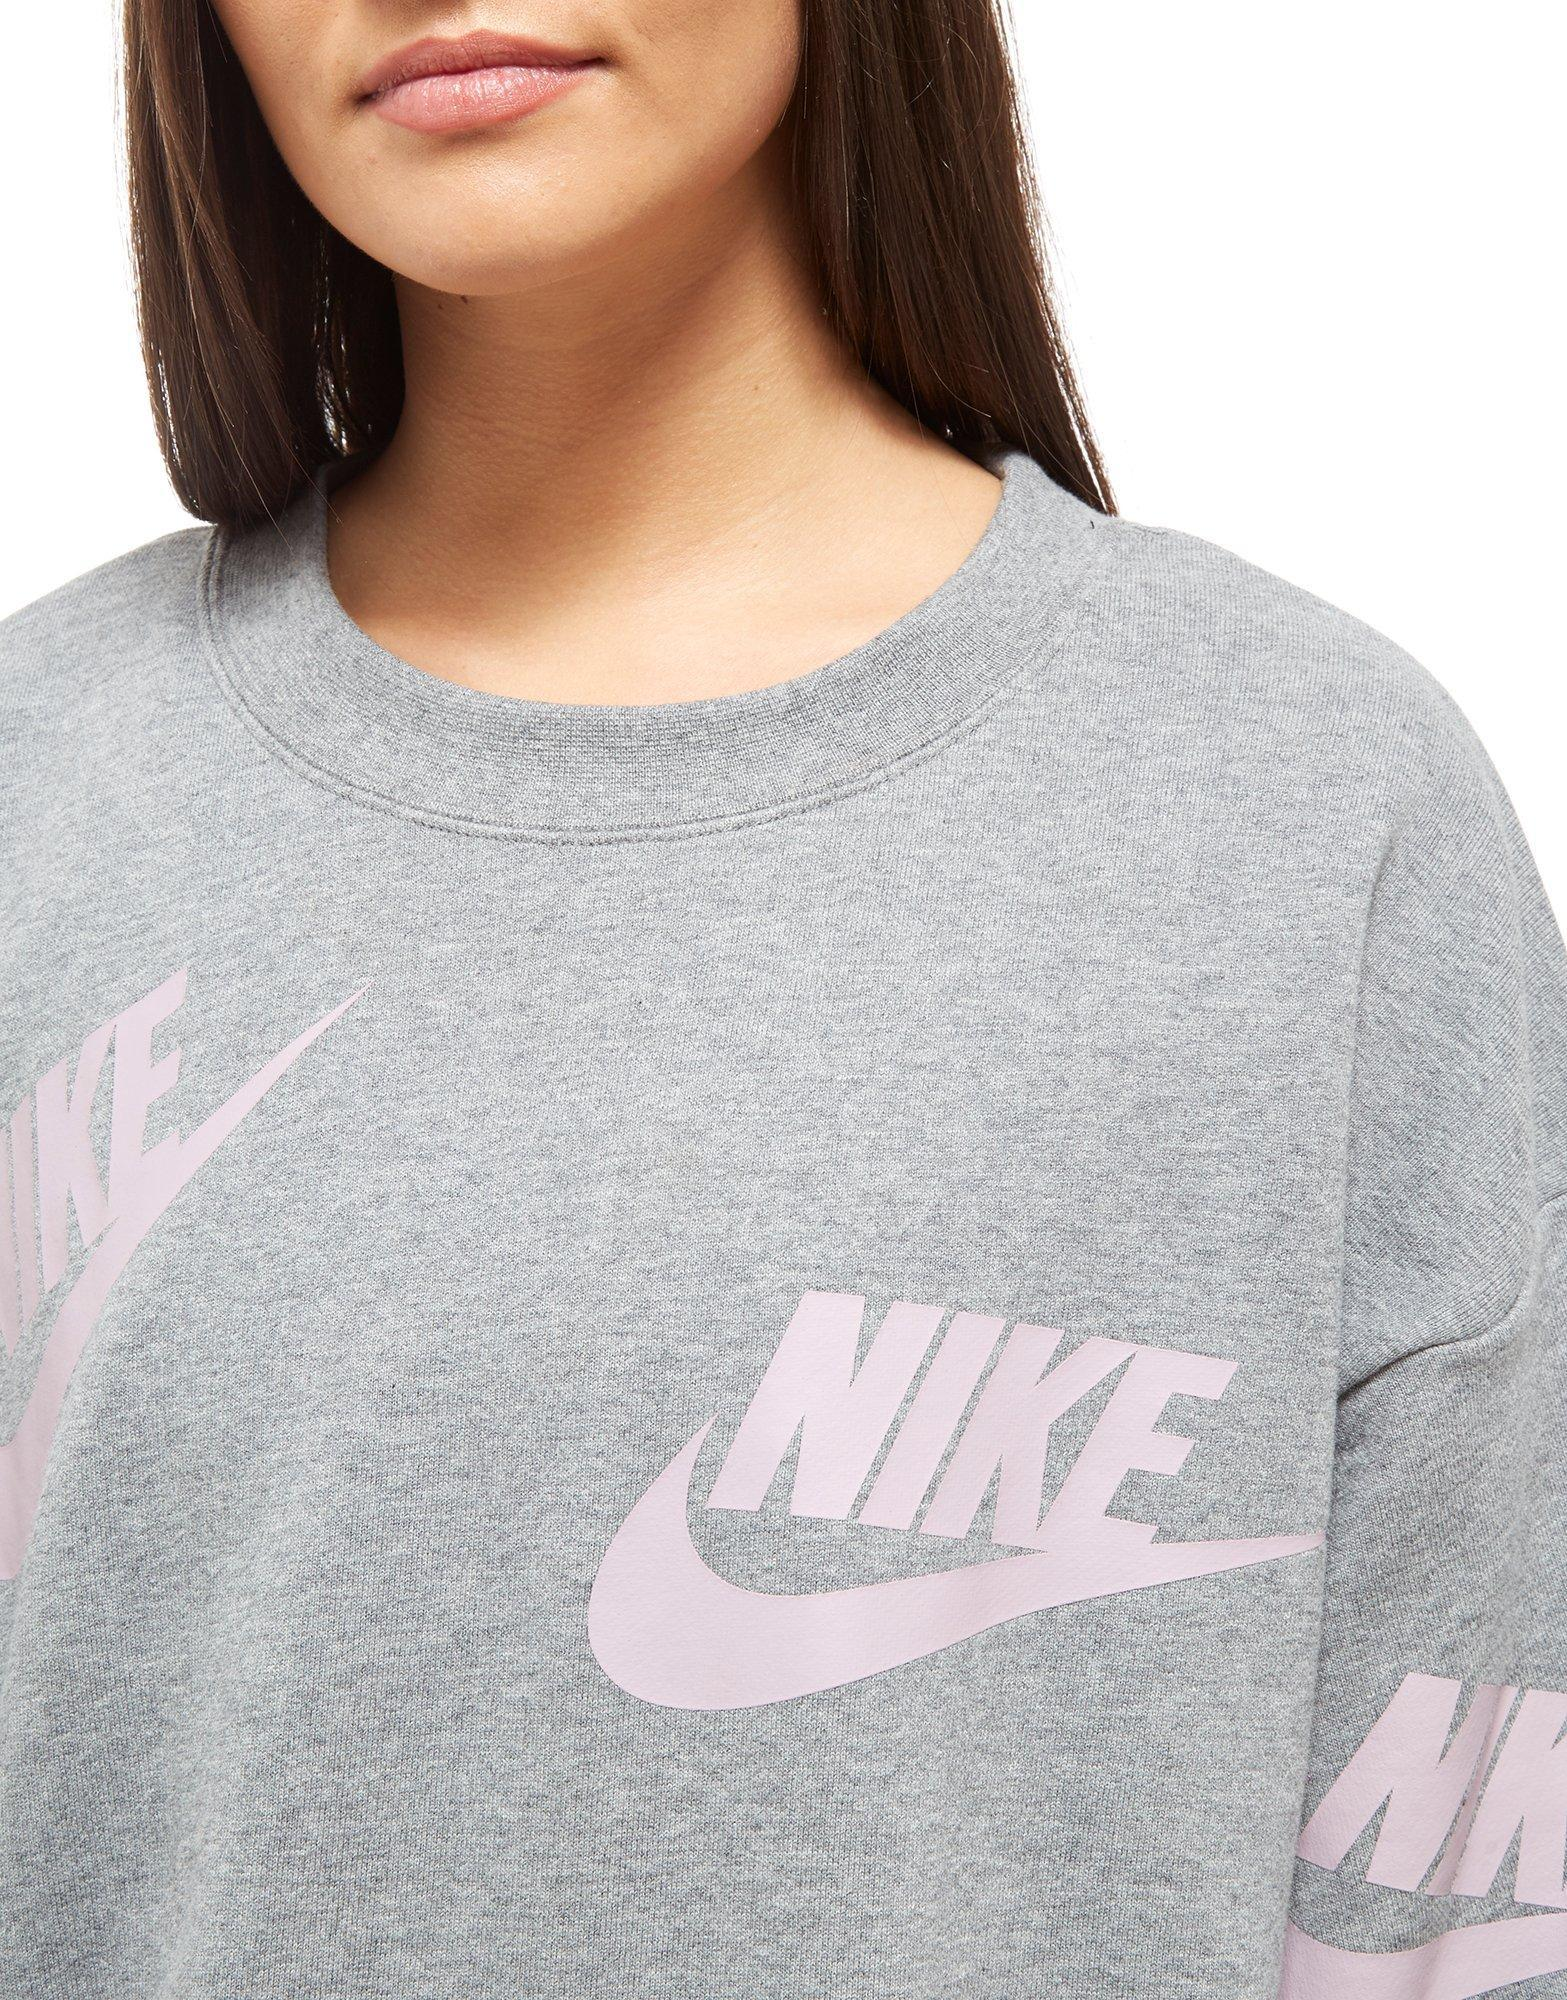 Nike Gray Crew All In Over Lyst Sweatshirt Futura Print OPN0kX8Znw